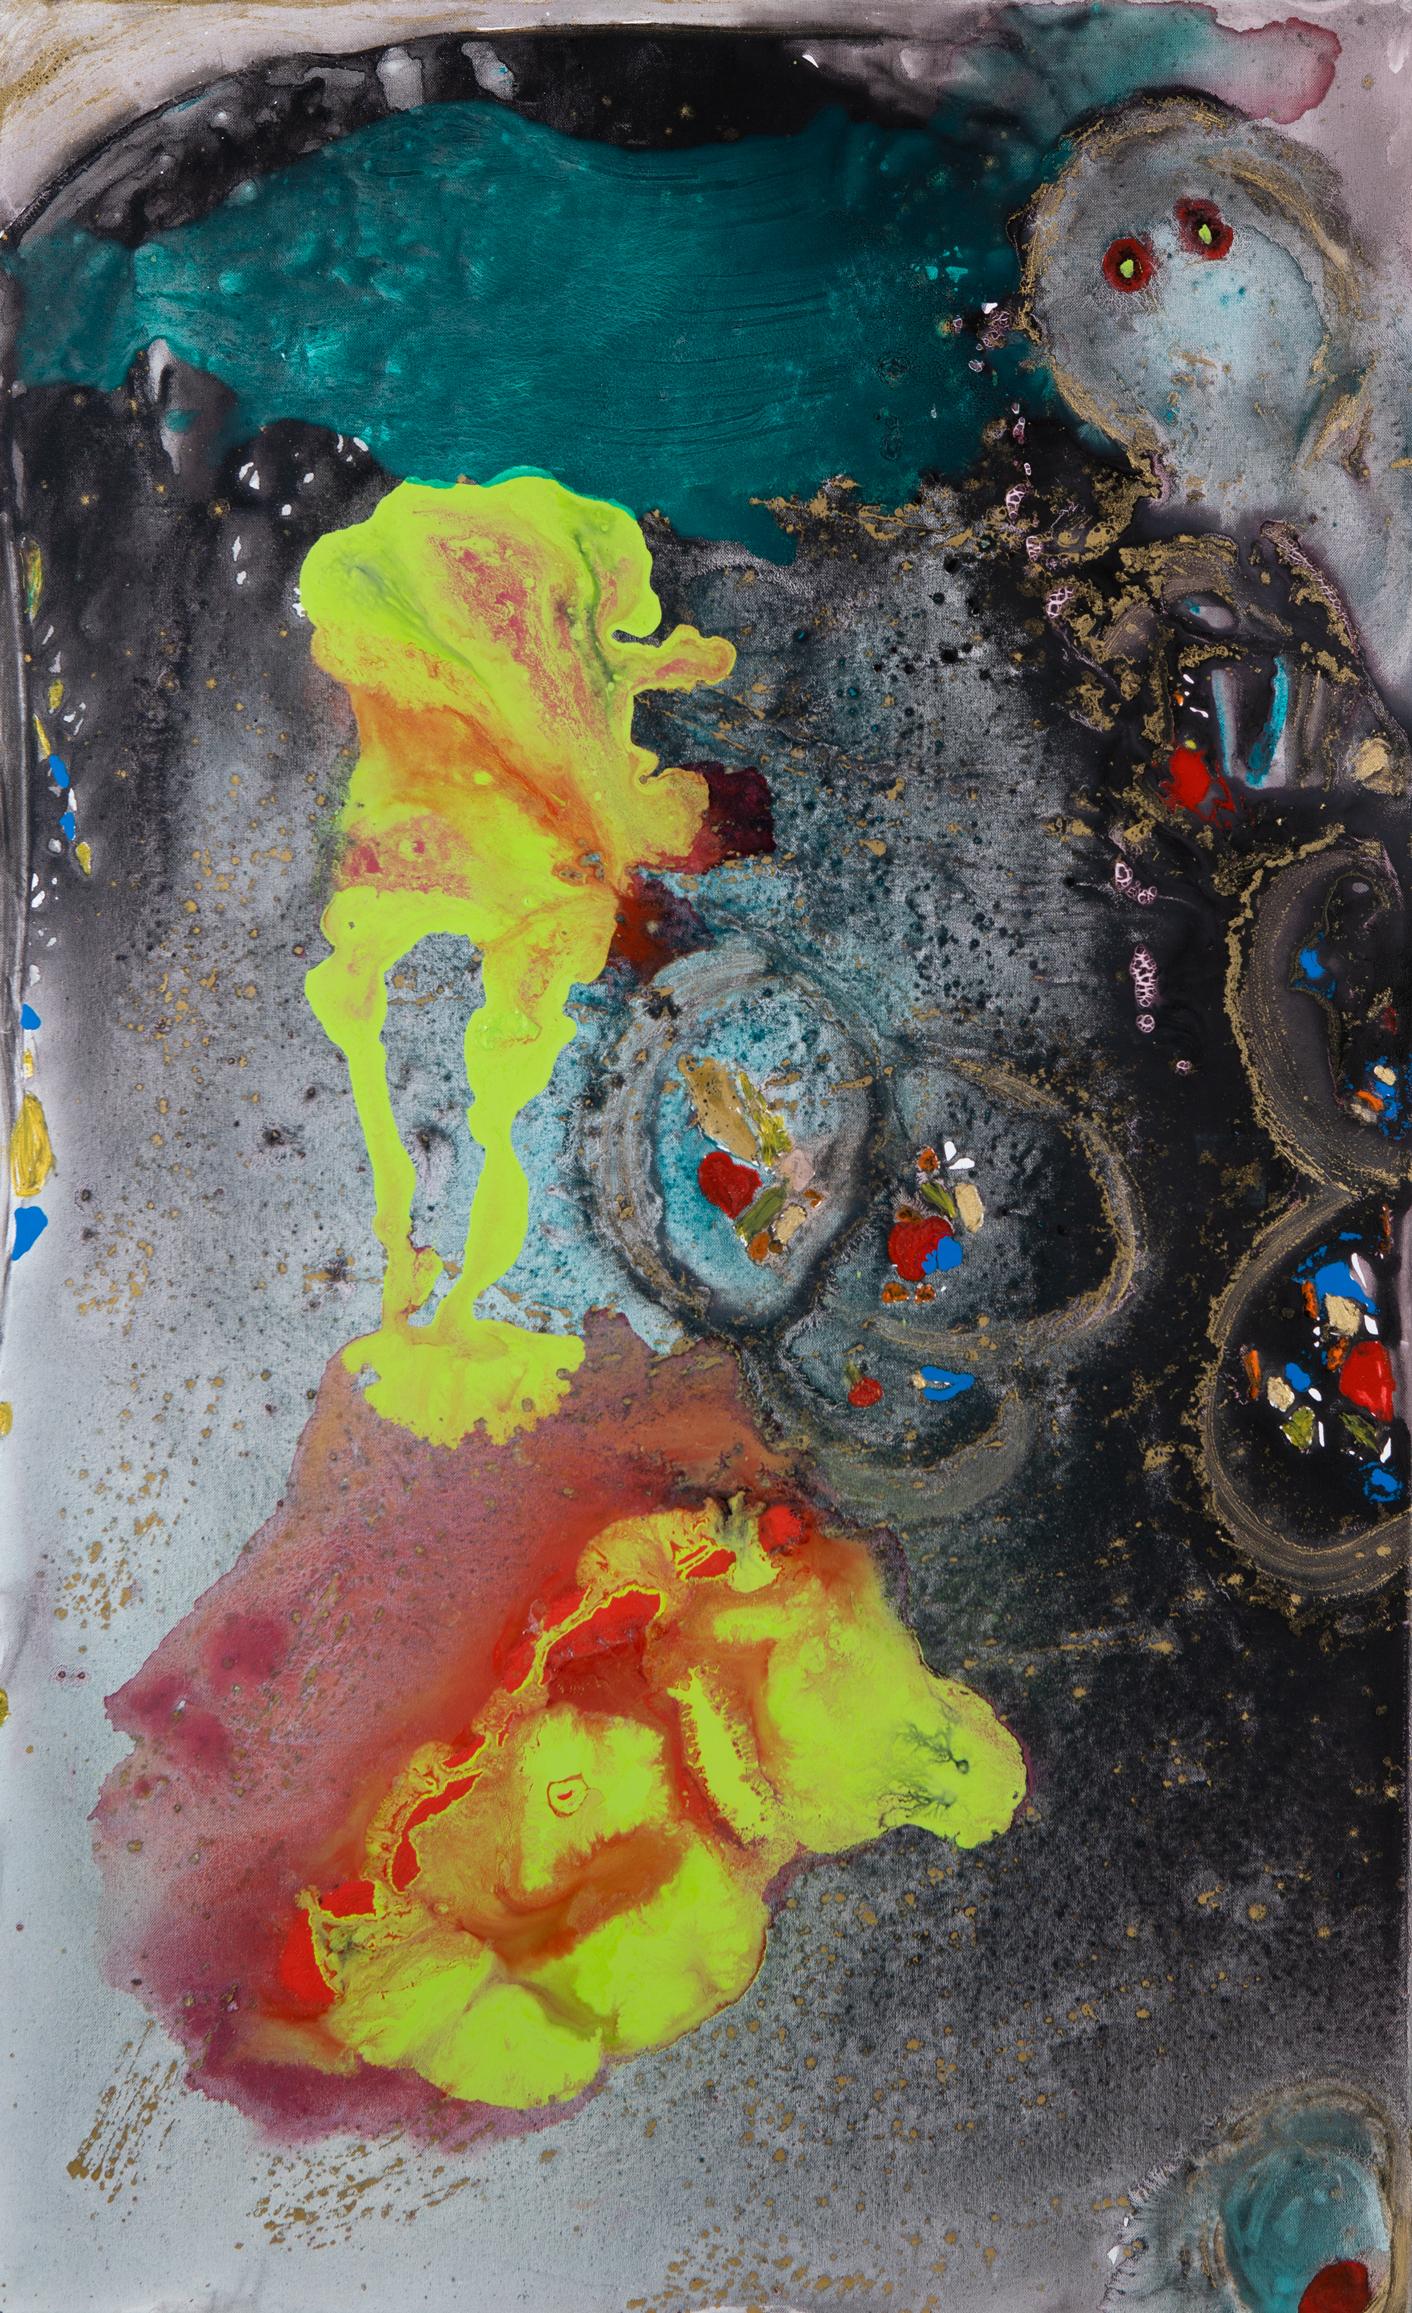 Fee - 2017Acryl auf Leinwand130 x 80 cm